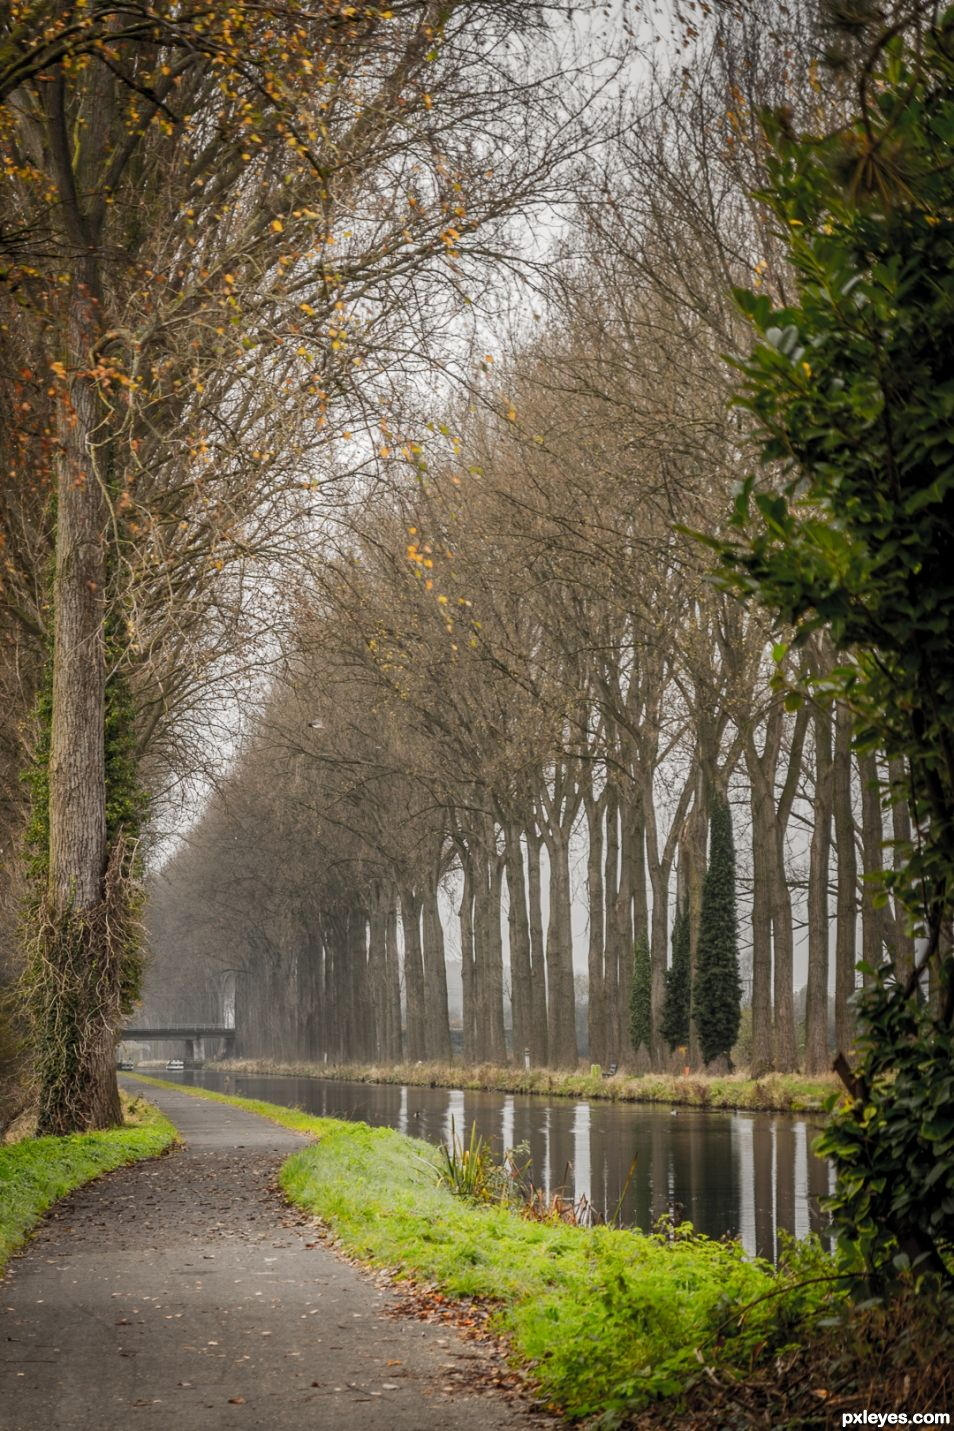 Peacefull walk